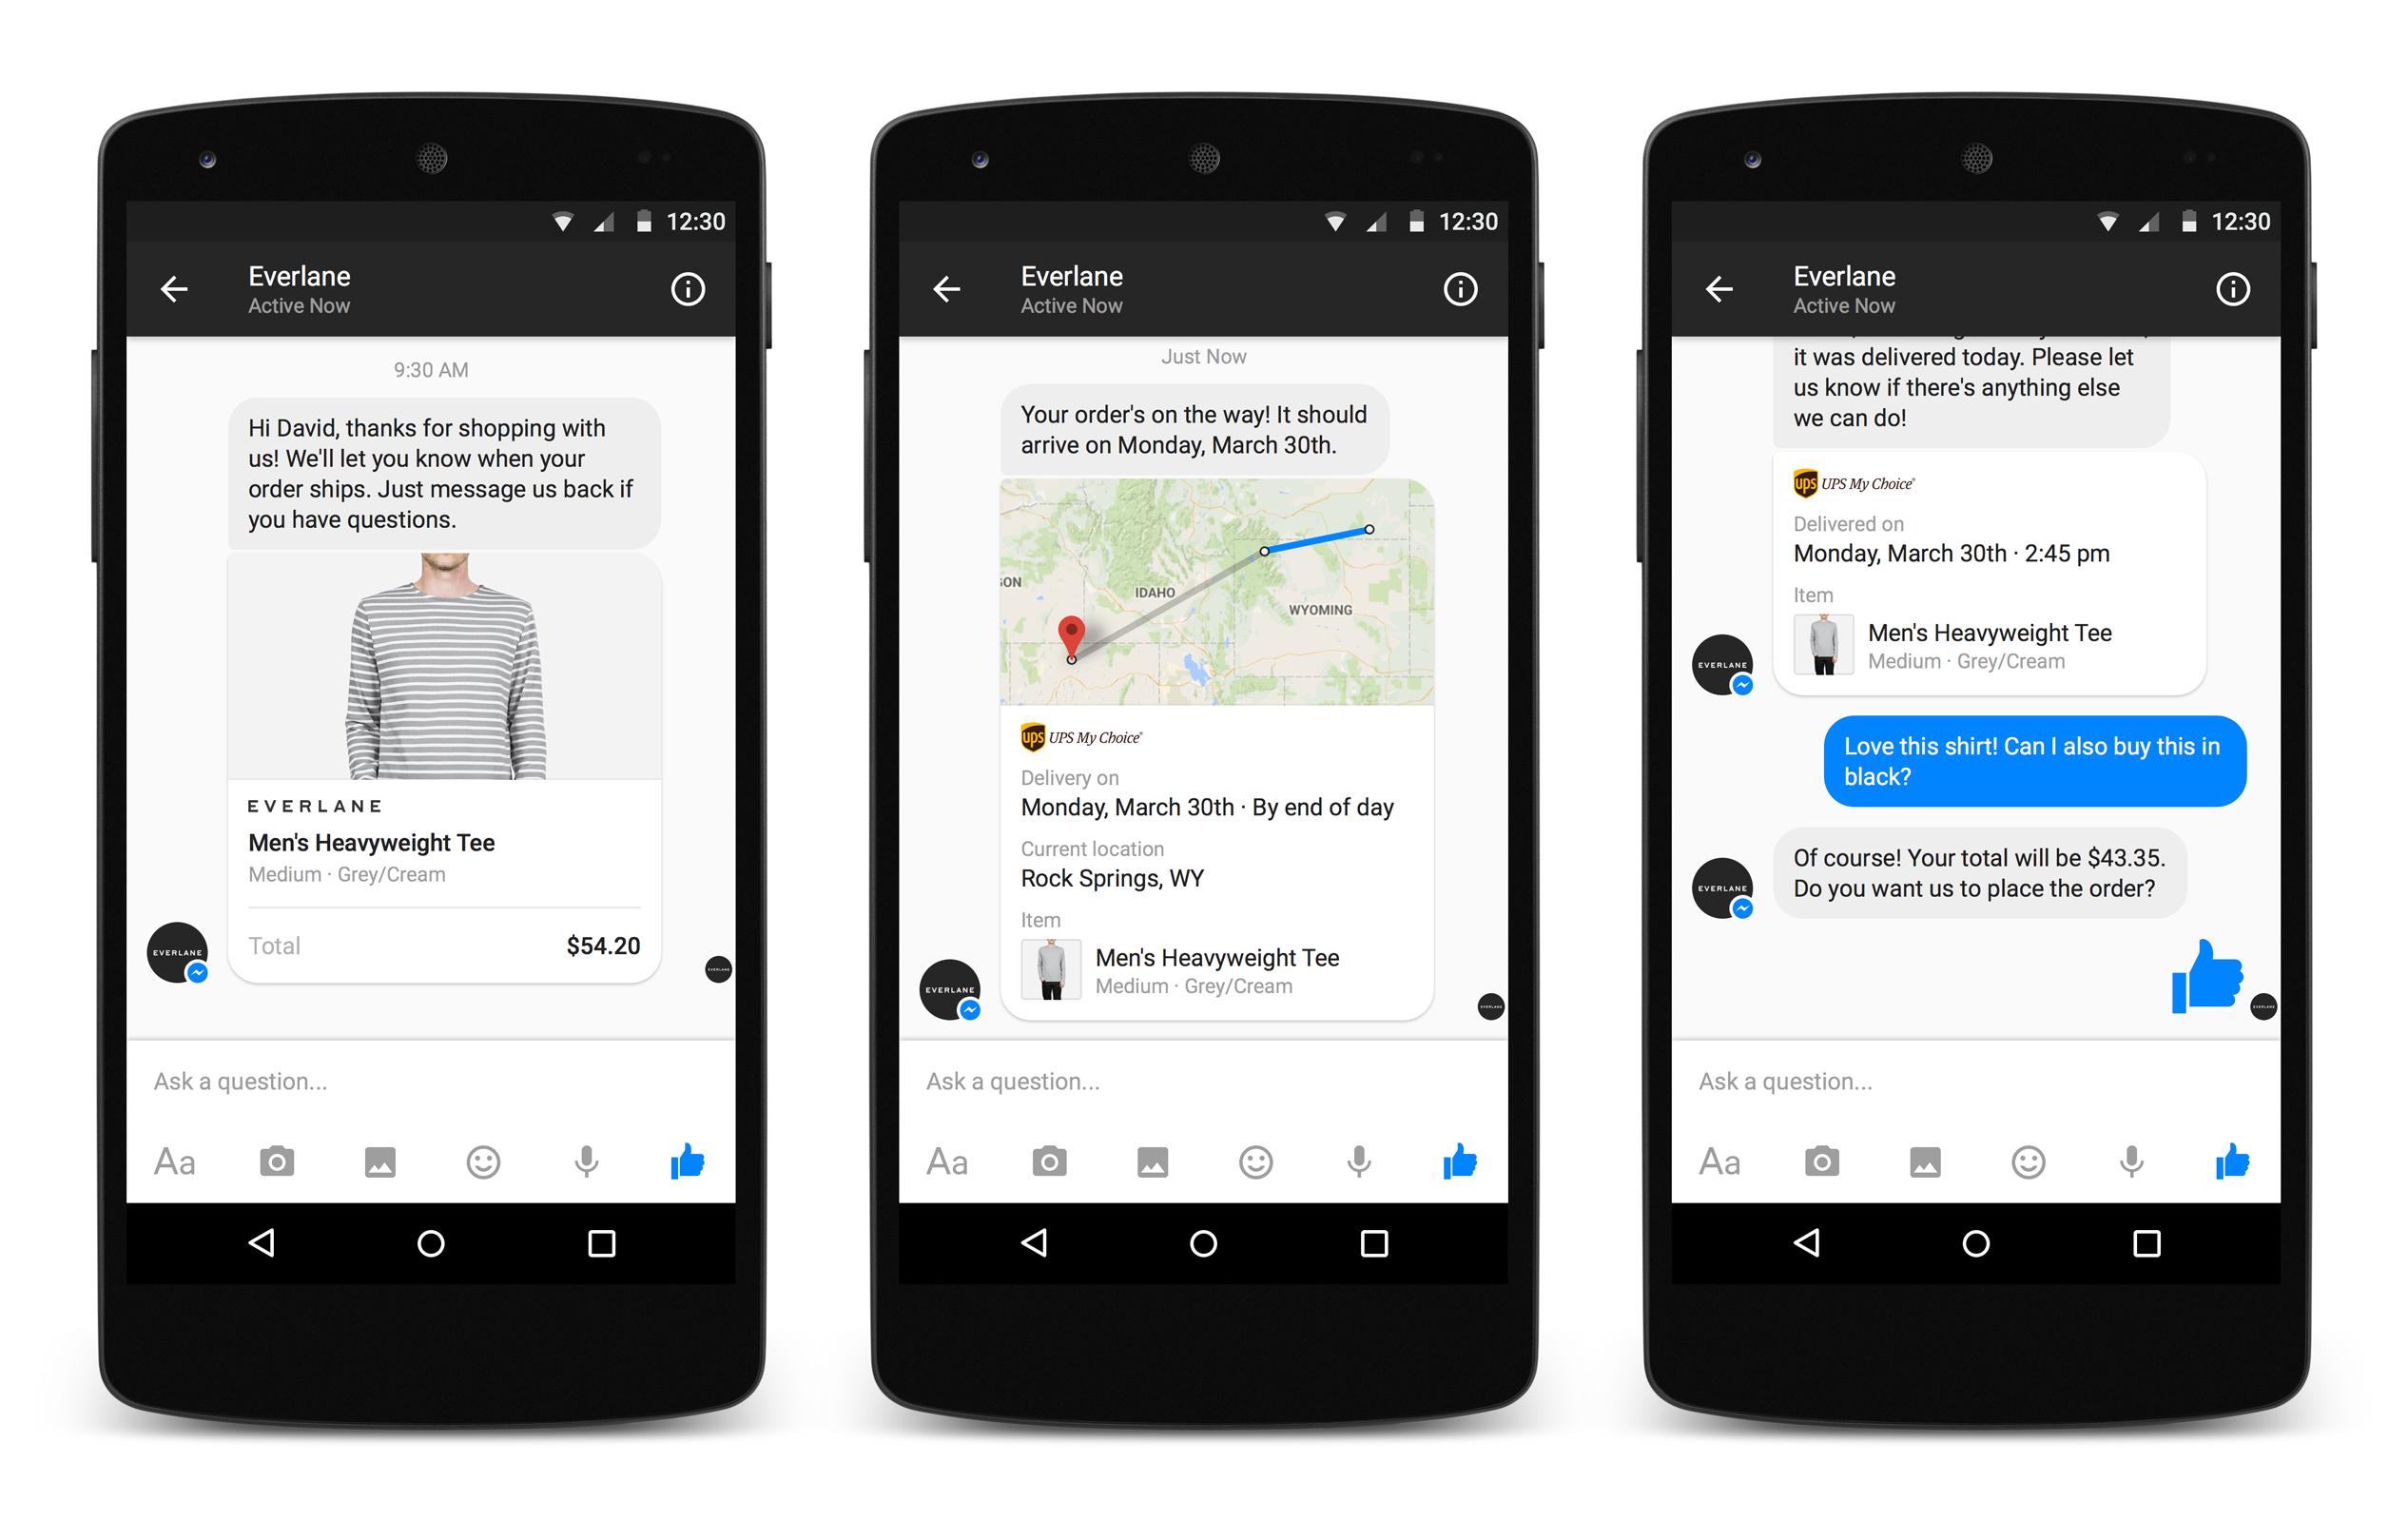 Businesses On Messenger - Facebook F8 Conference